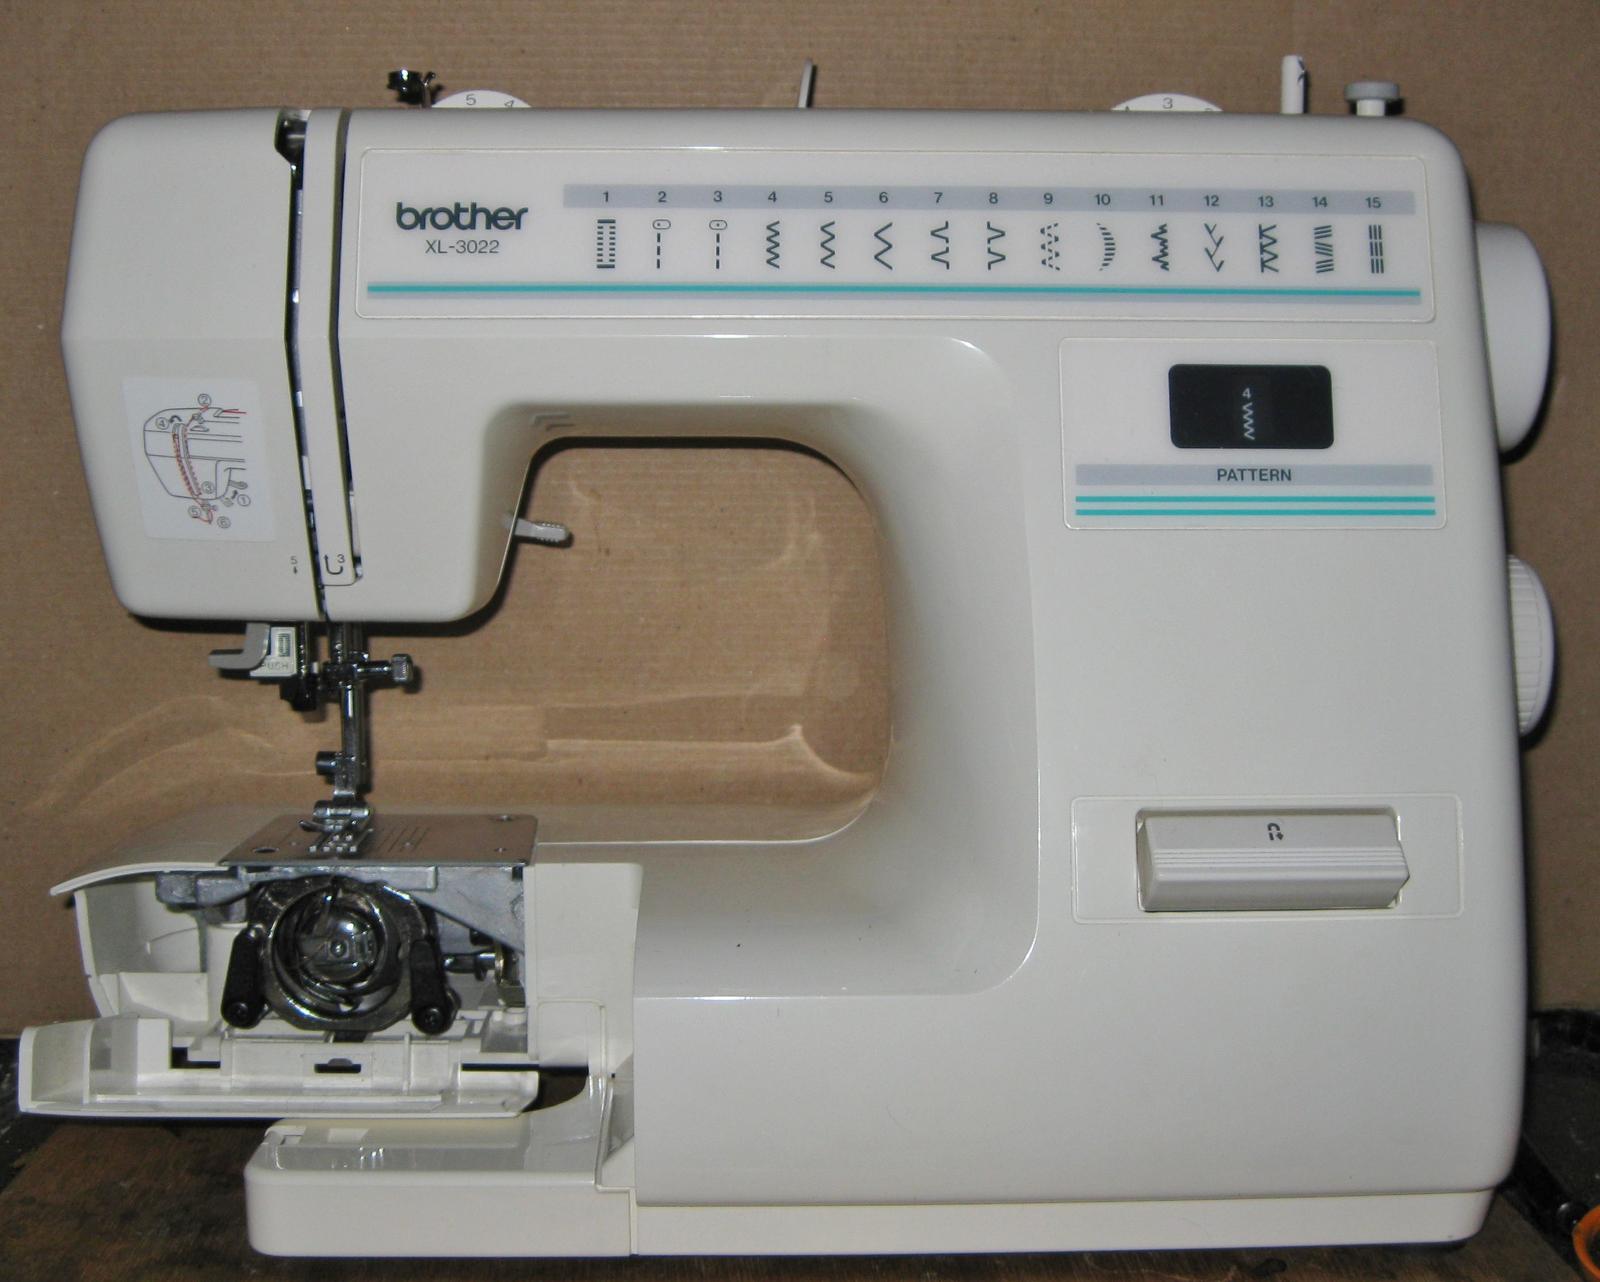 xl 5130 sewing machine price